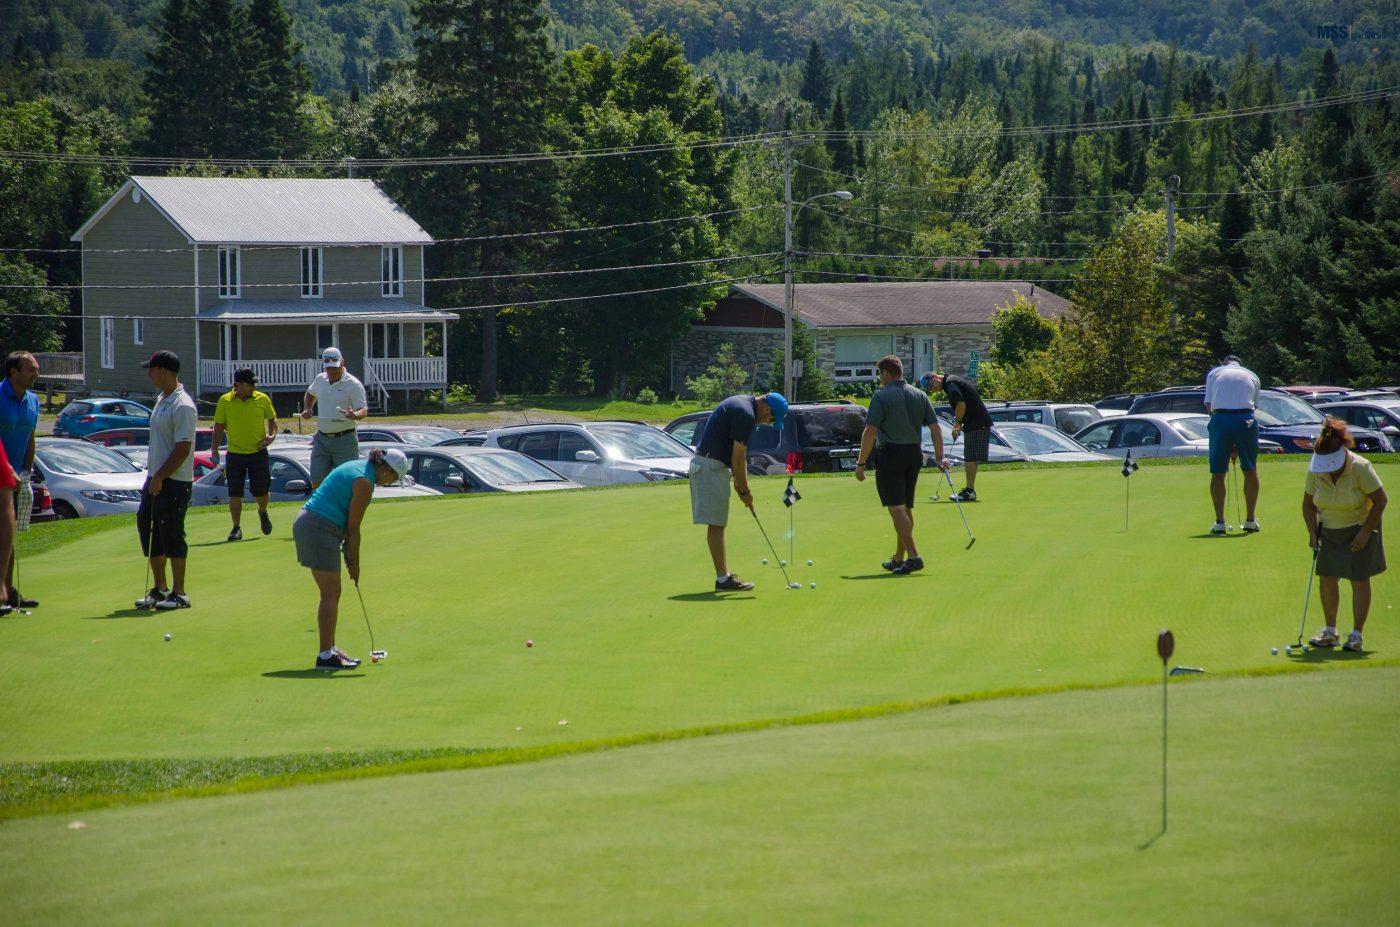 Tournoi de golf de la Fondation Conrad Bélanger de 2014